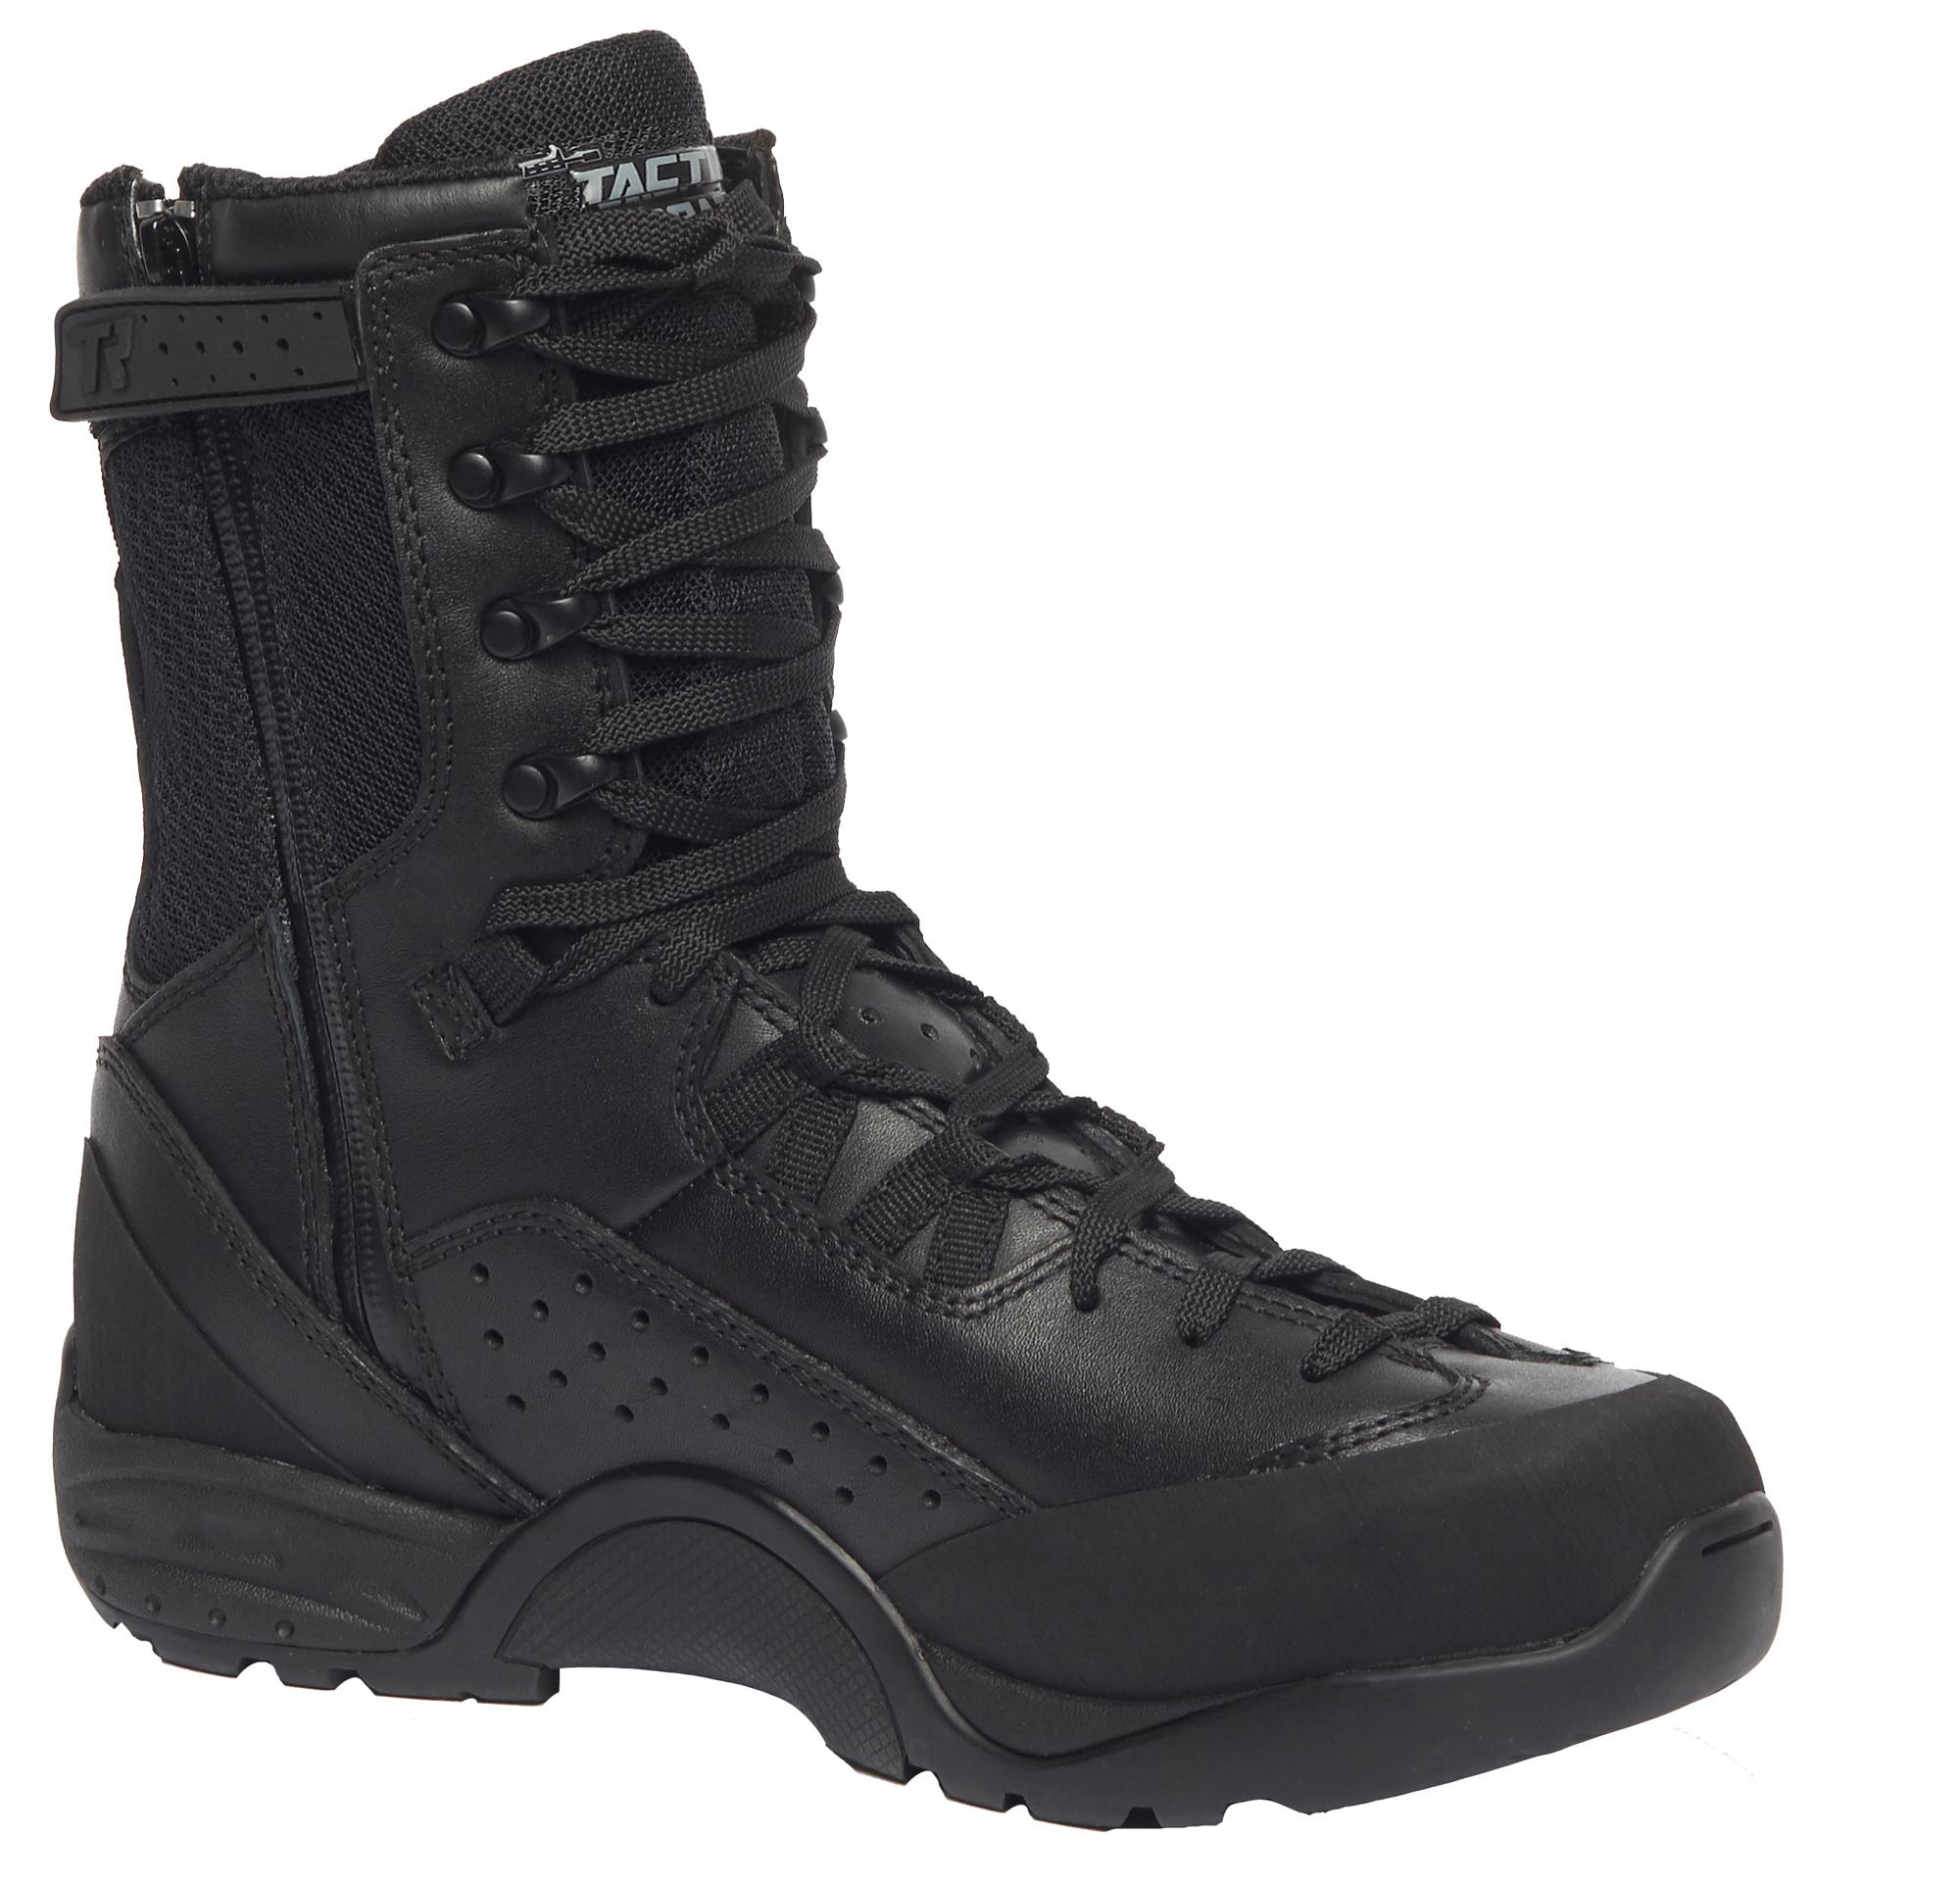 Belleville Hot Weather Tactical Zip Boots Unisex Black Leather/Mesh